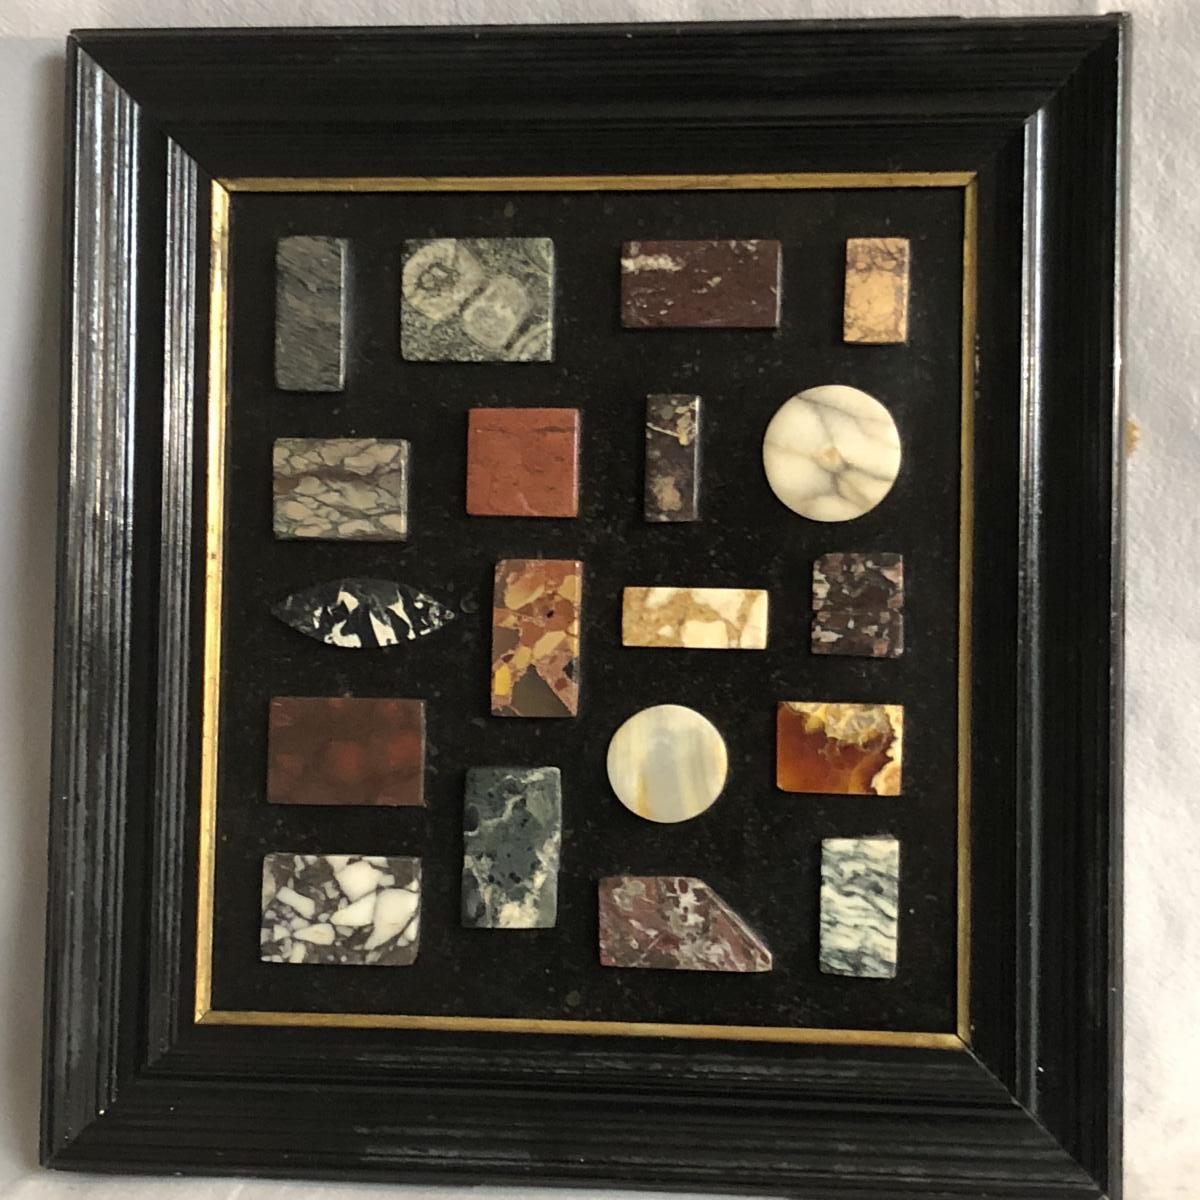 RARE CADRE XIXe avec divers échantillons de marbres Marmothèque Lithothèque